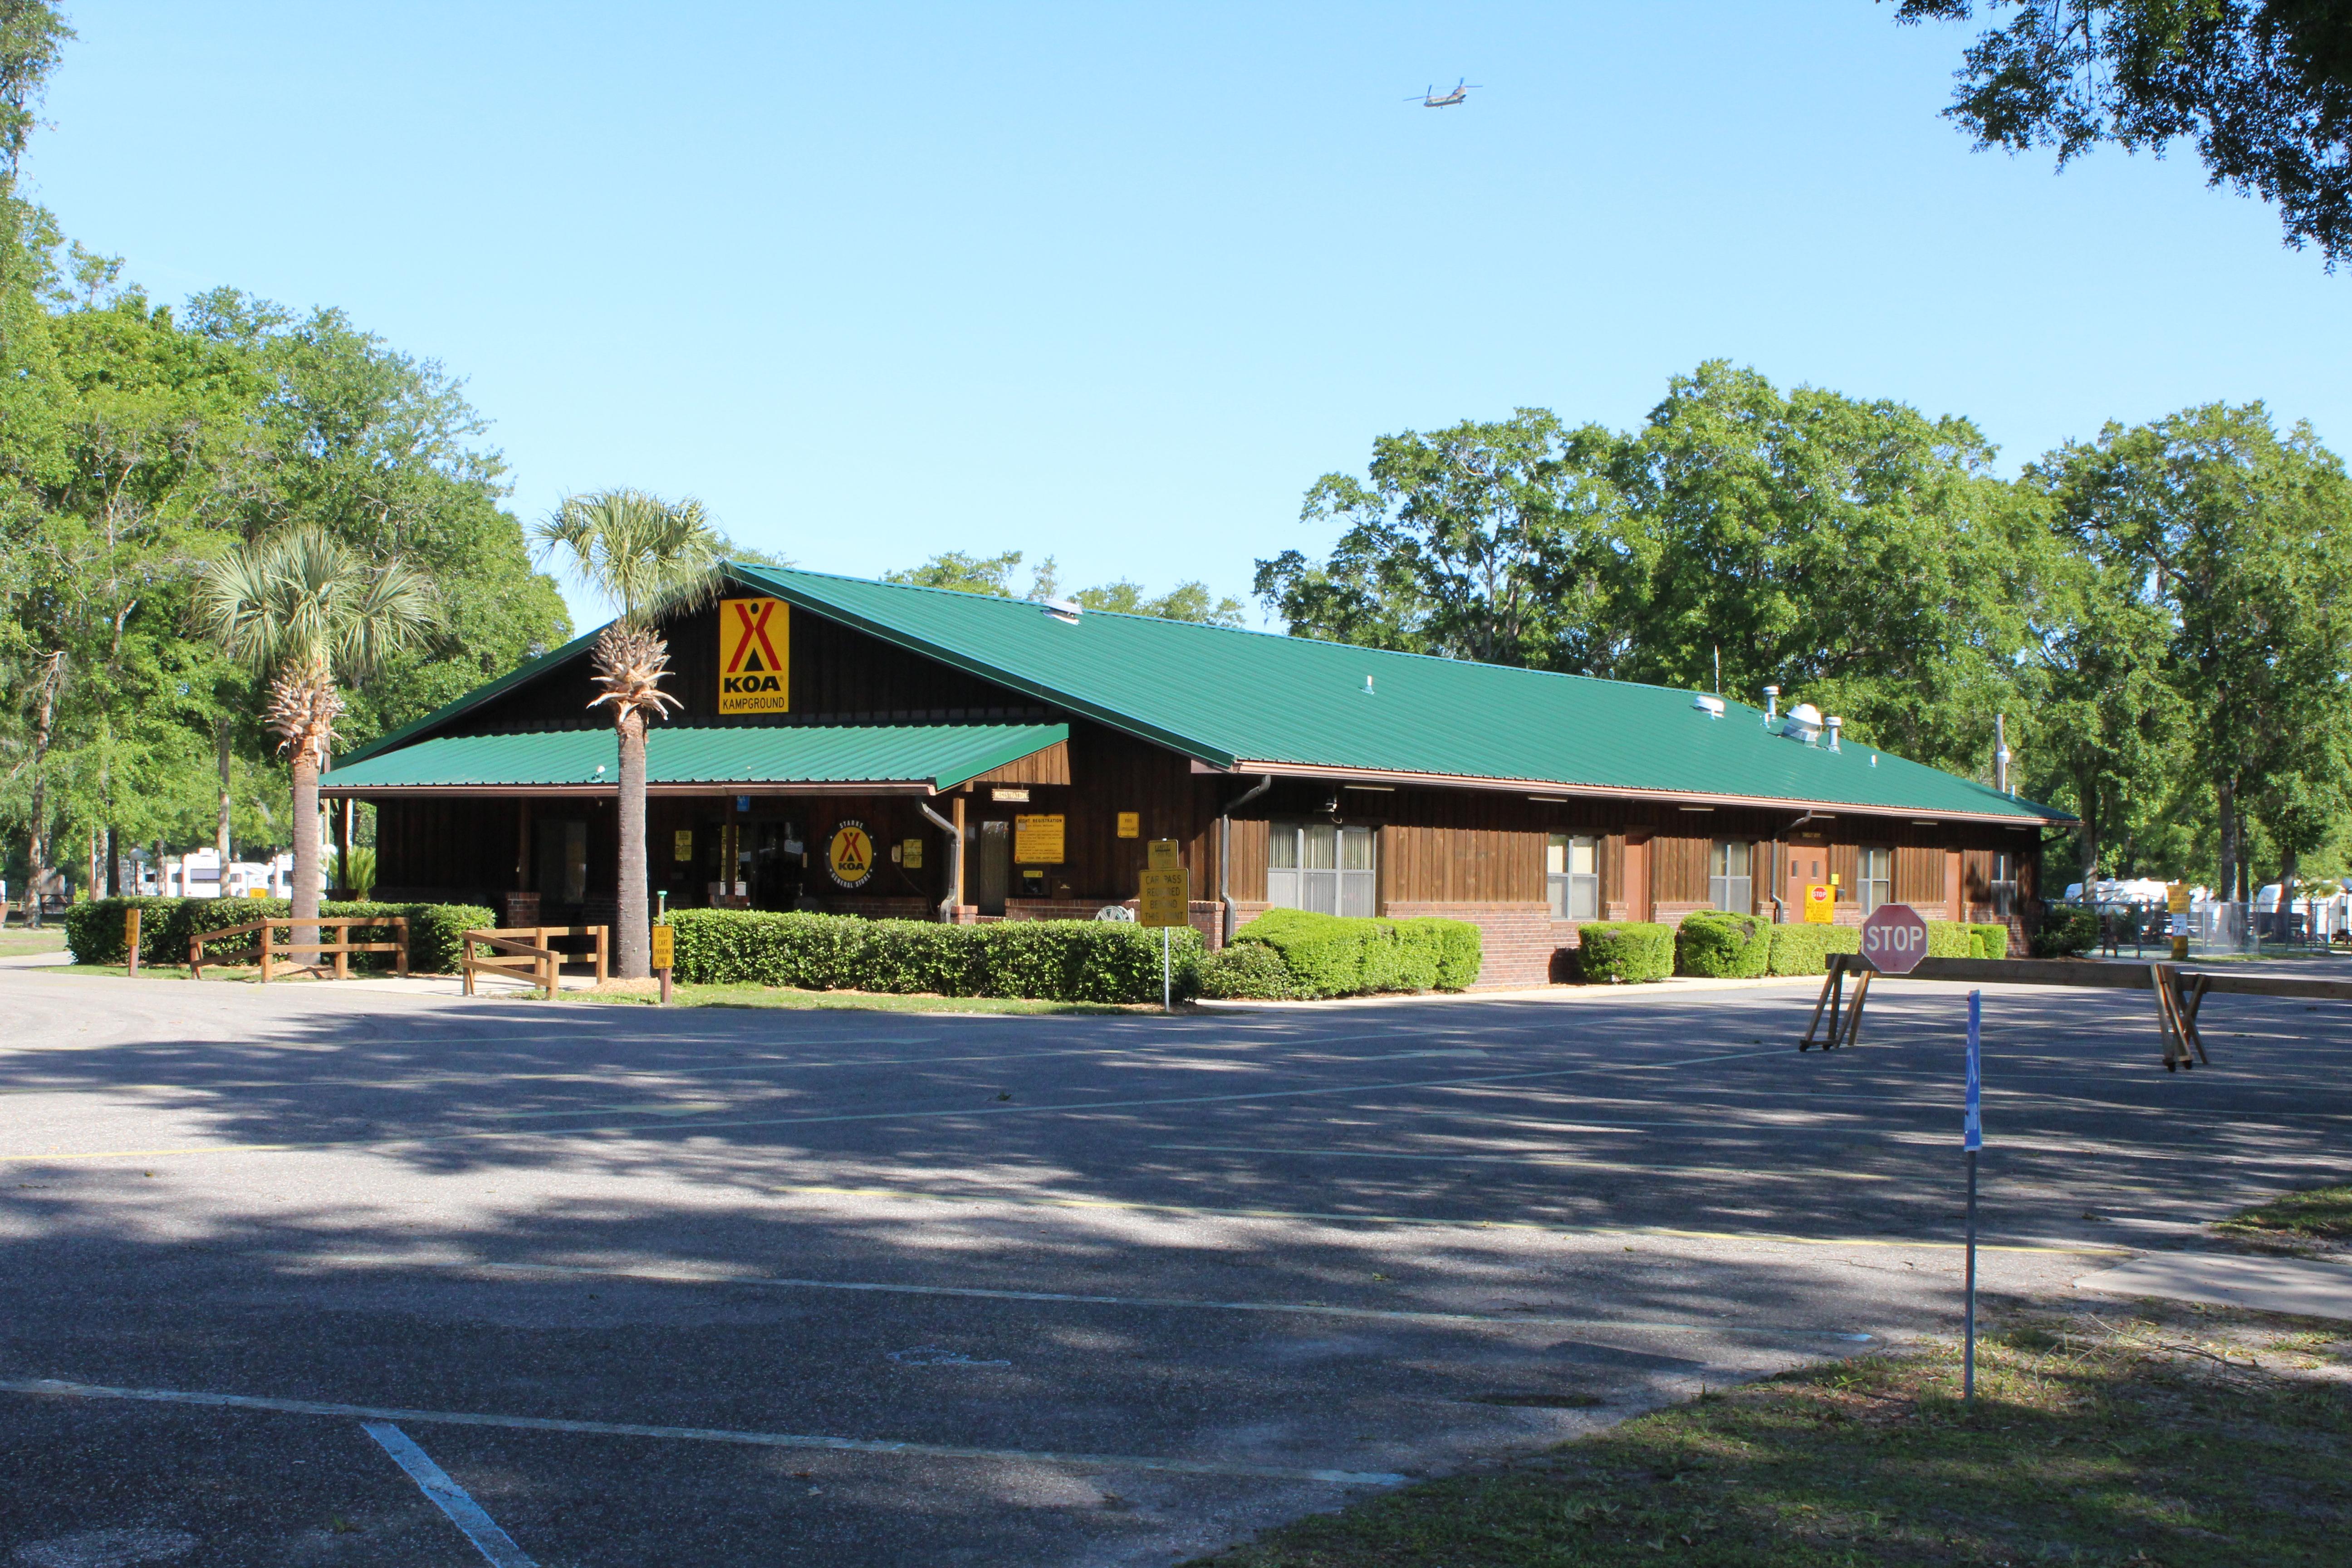 Starke / Gainesville N.E. KOA image 0